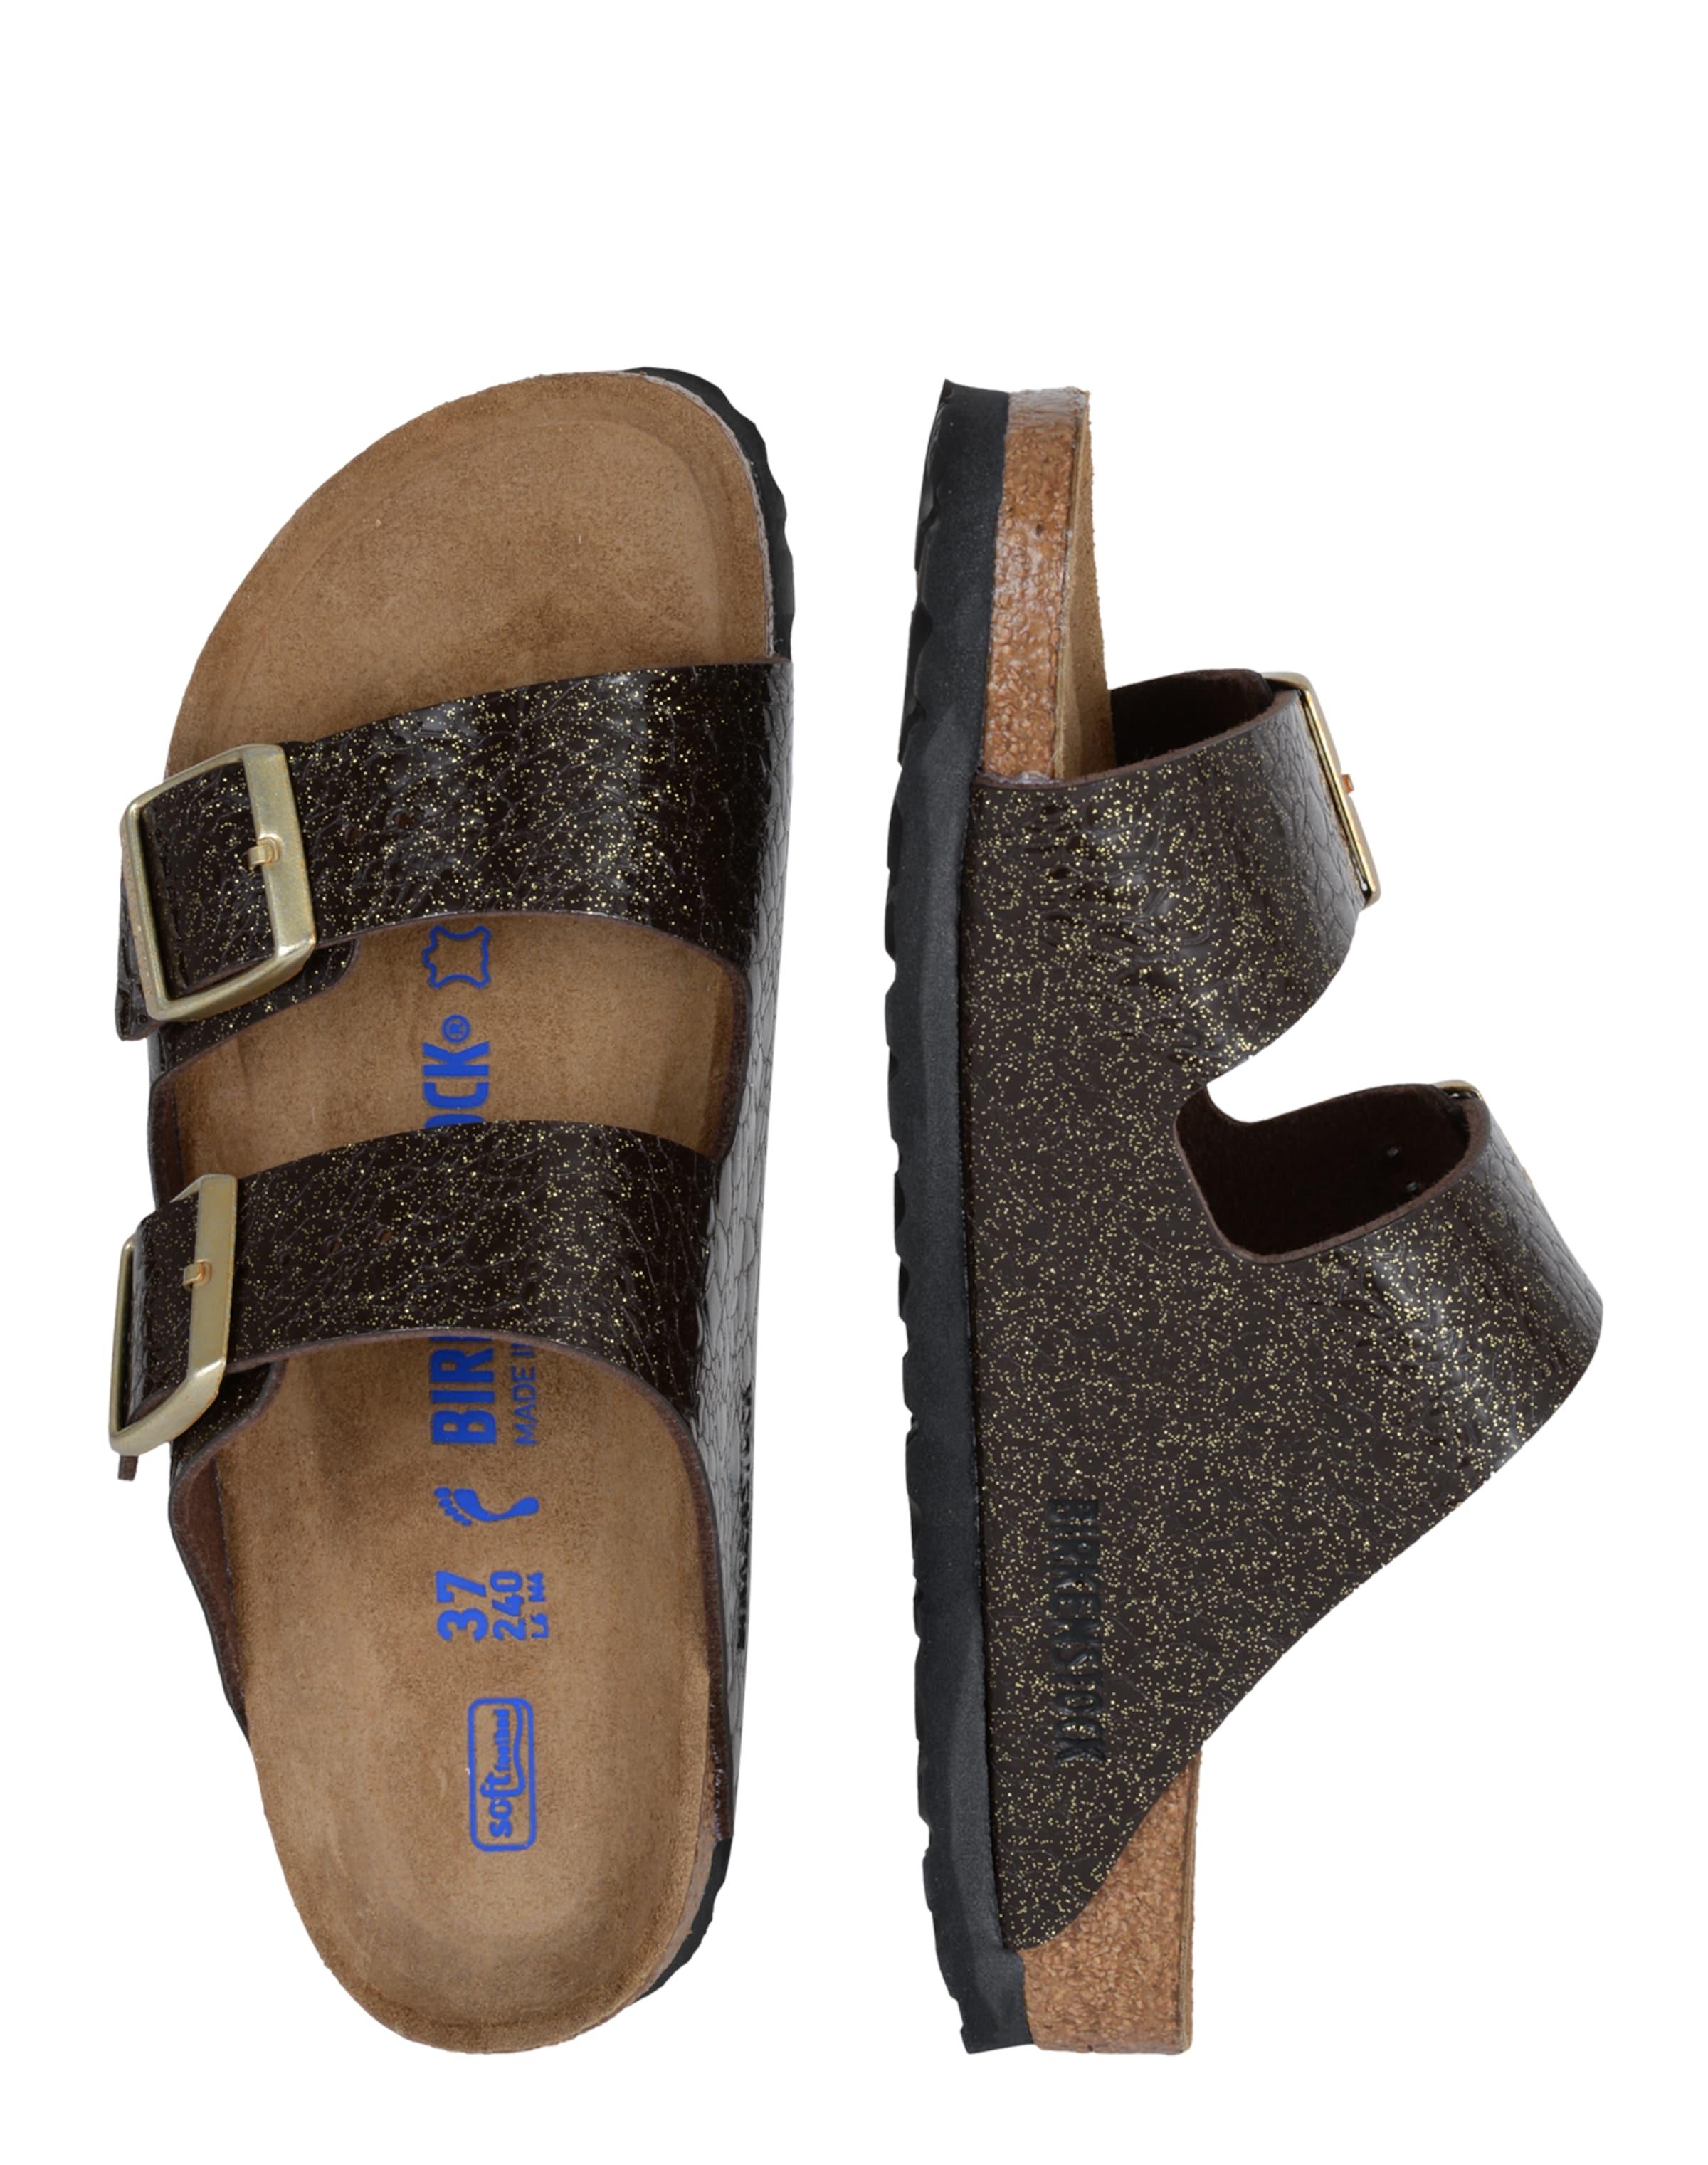 Pantolette In Birkenstock Braun Pantolette 'arizona' In Birkenstock 'arizona' Braun 1Tlc3uFK5J